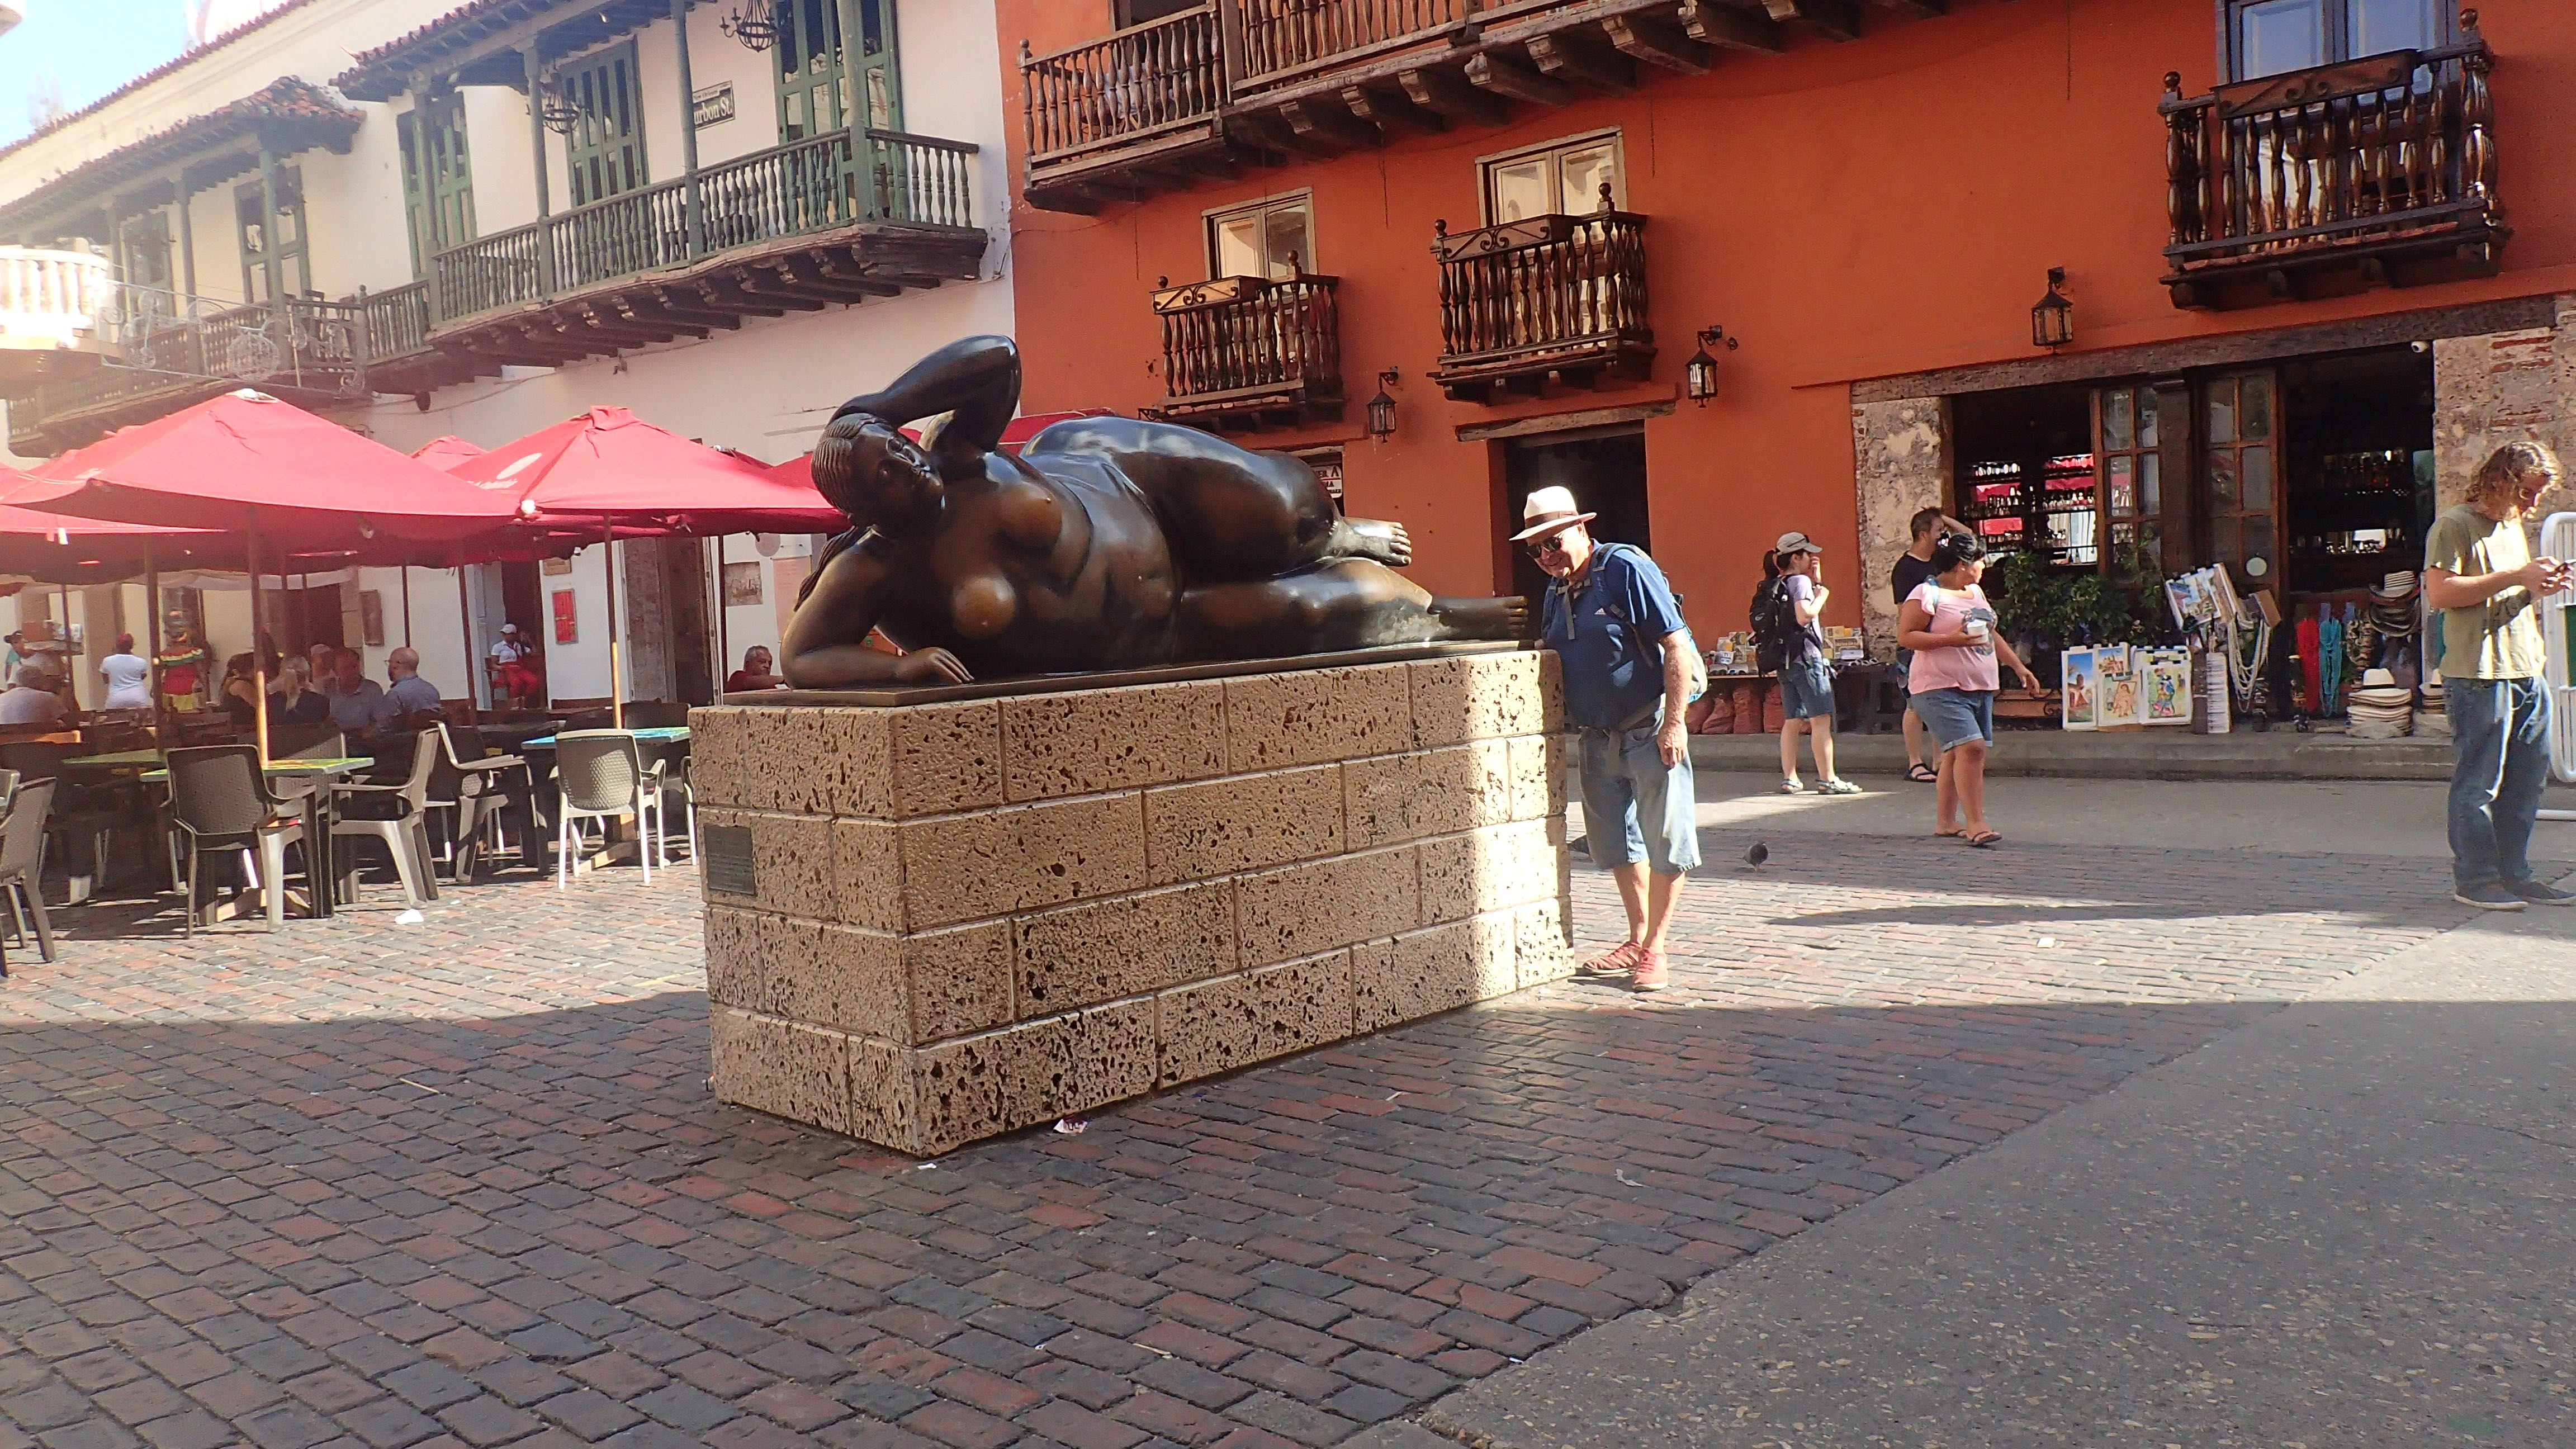 Tiens encore une statue Boterro